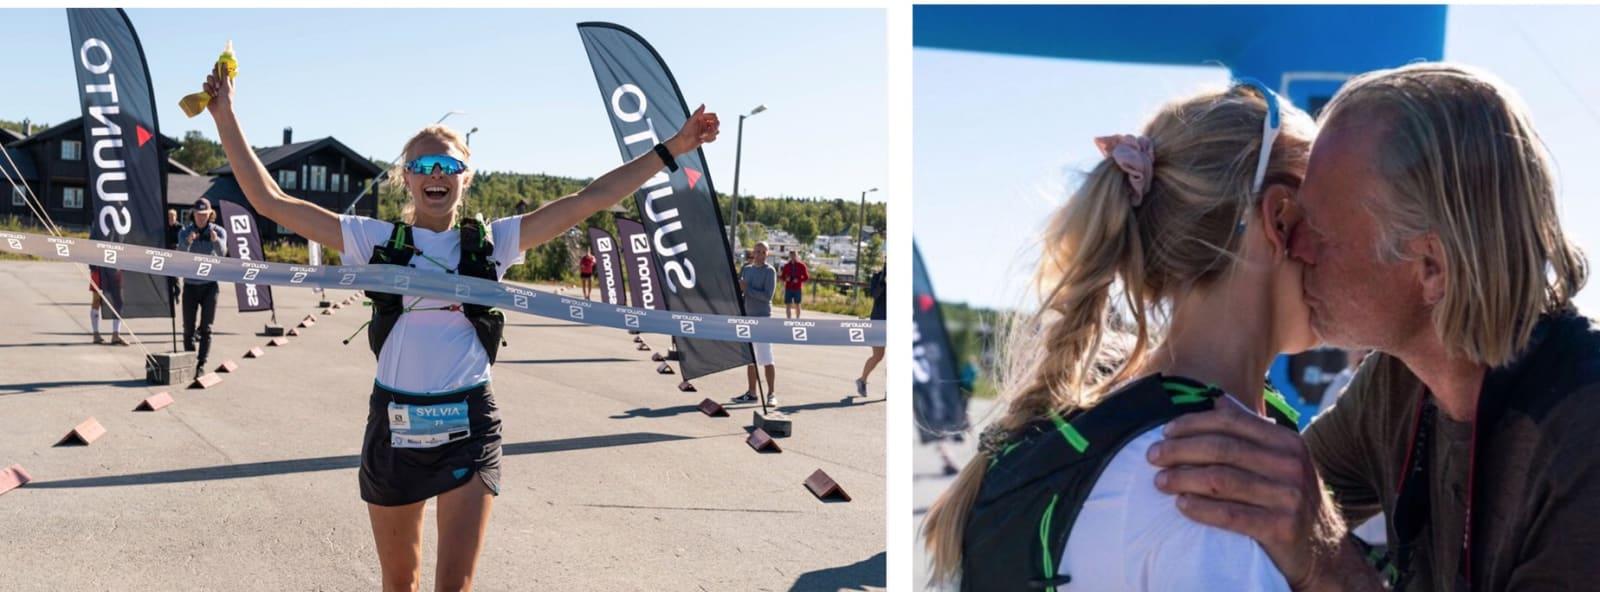 BESTE DAME: Sylvia Nordskar i mål